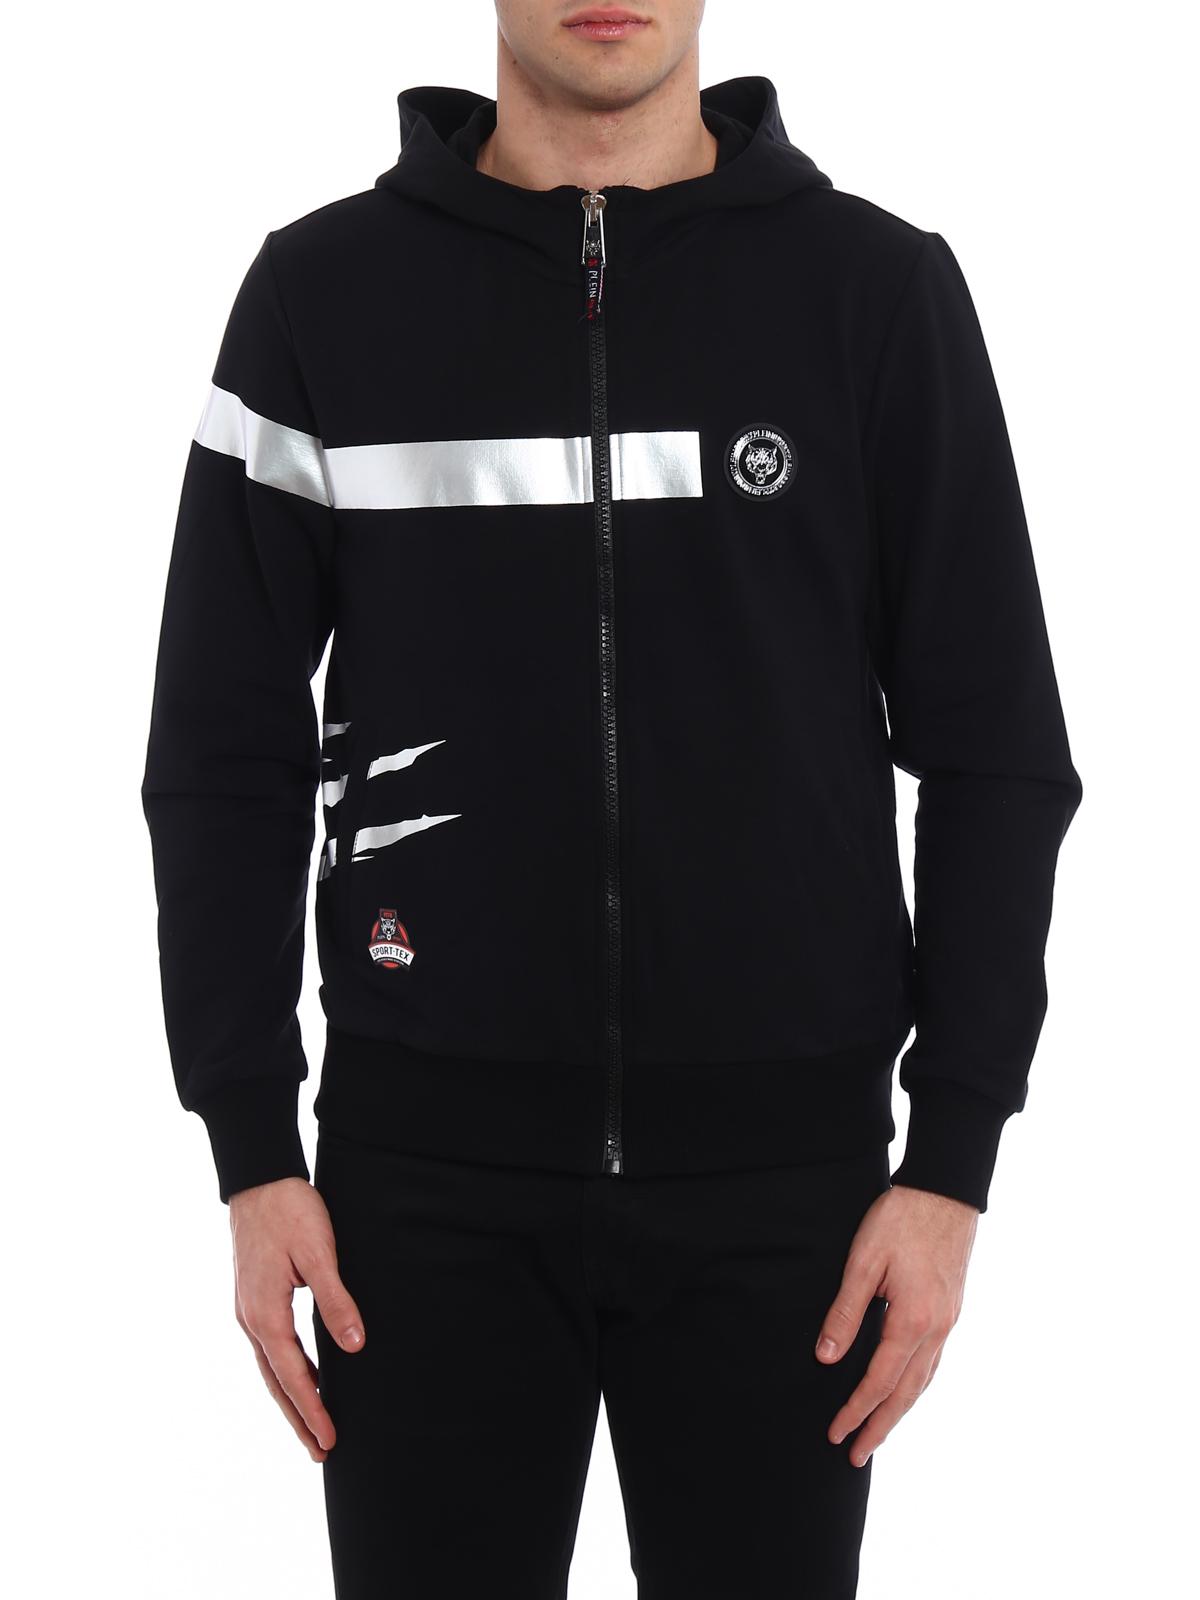 Potency Stretch Hoodie Plein Jersey Sweaters Sweatshirts Sport amp; 5HxqZP6